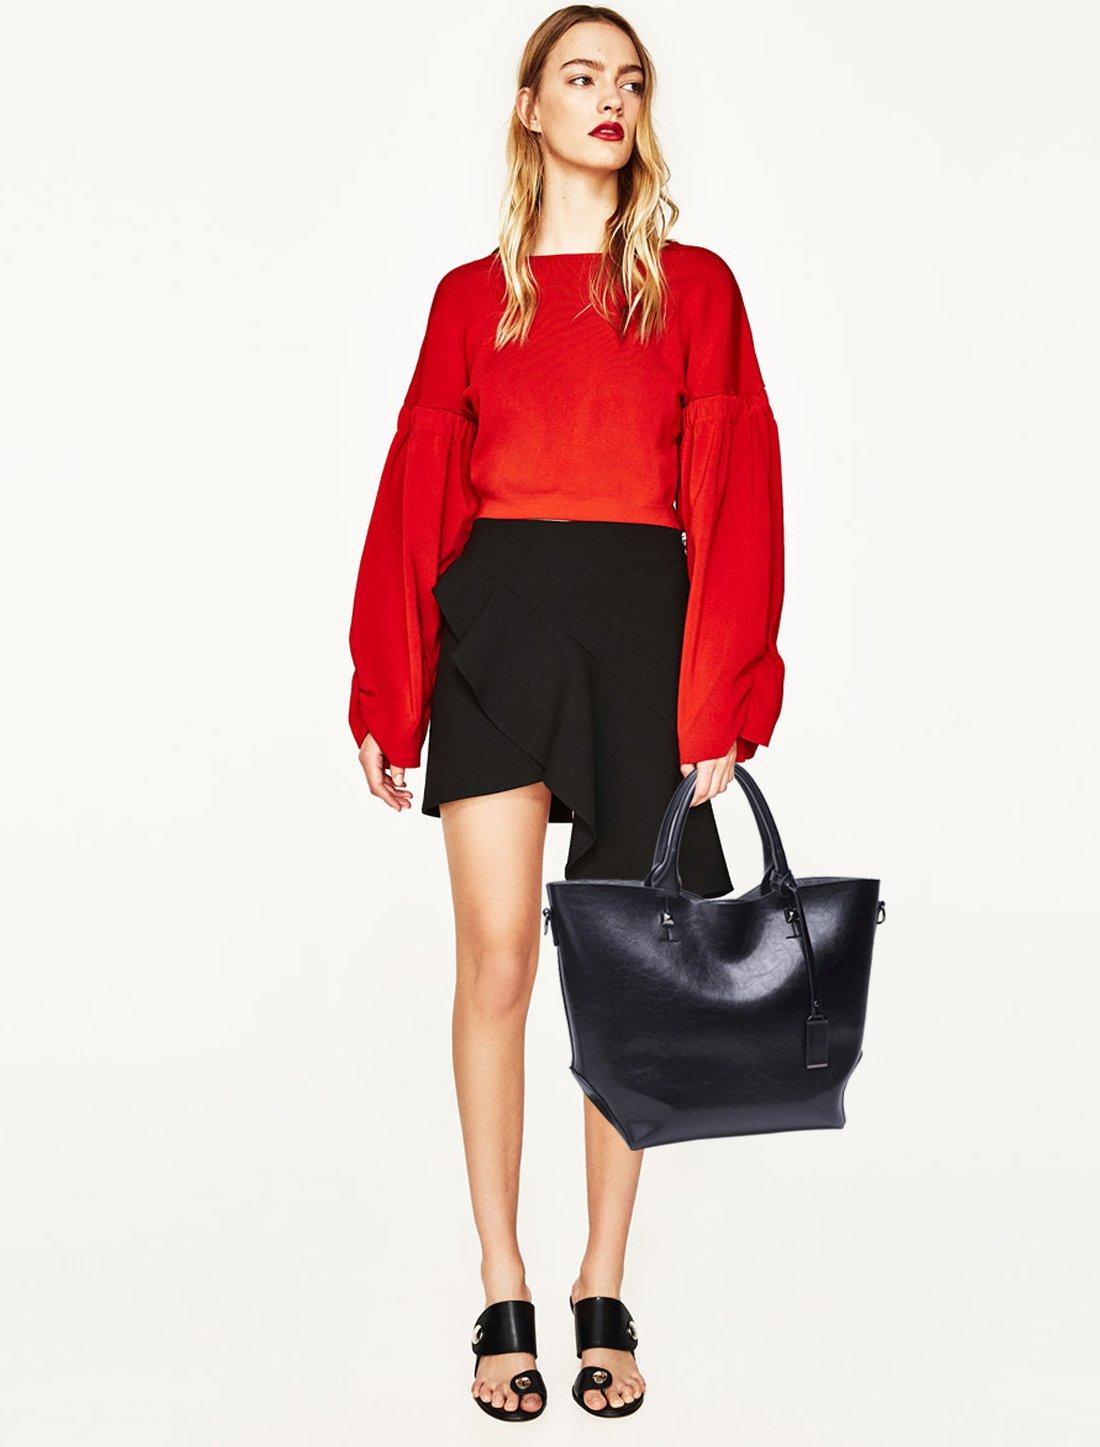 NICOLE/&DORIS Fashion Women Bucket Bag Tote Handbag Shoulder Bag Messenger Large Waterproof PU Leather Black